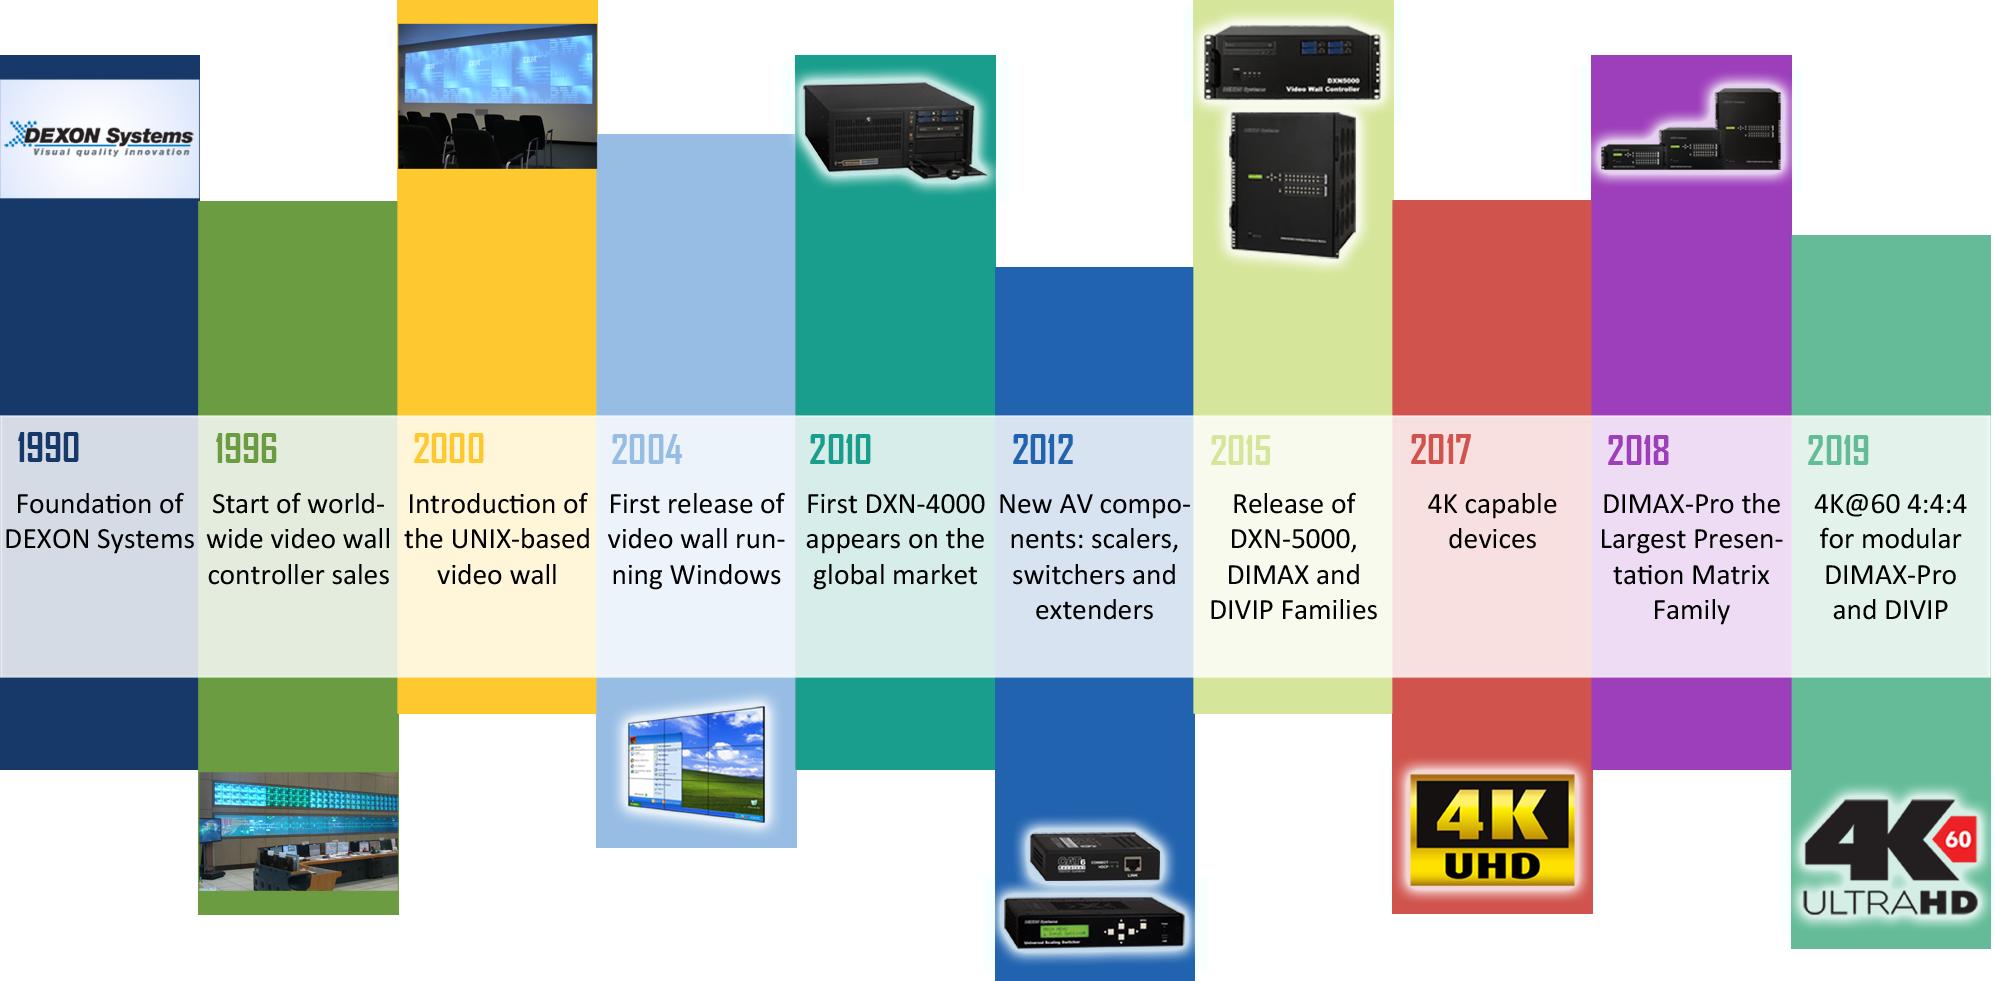 Dexon Systems timeline